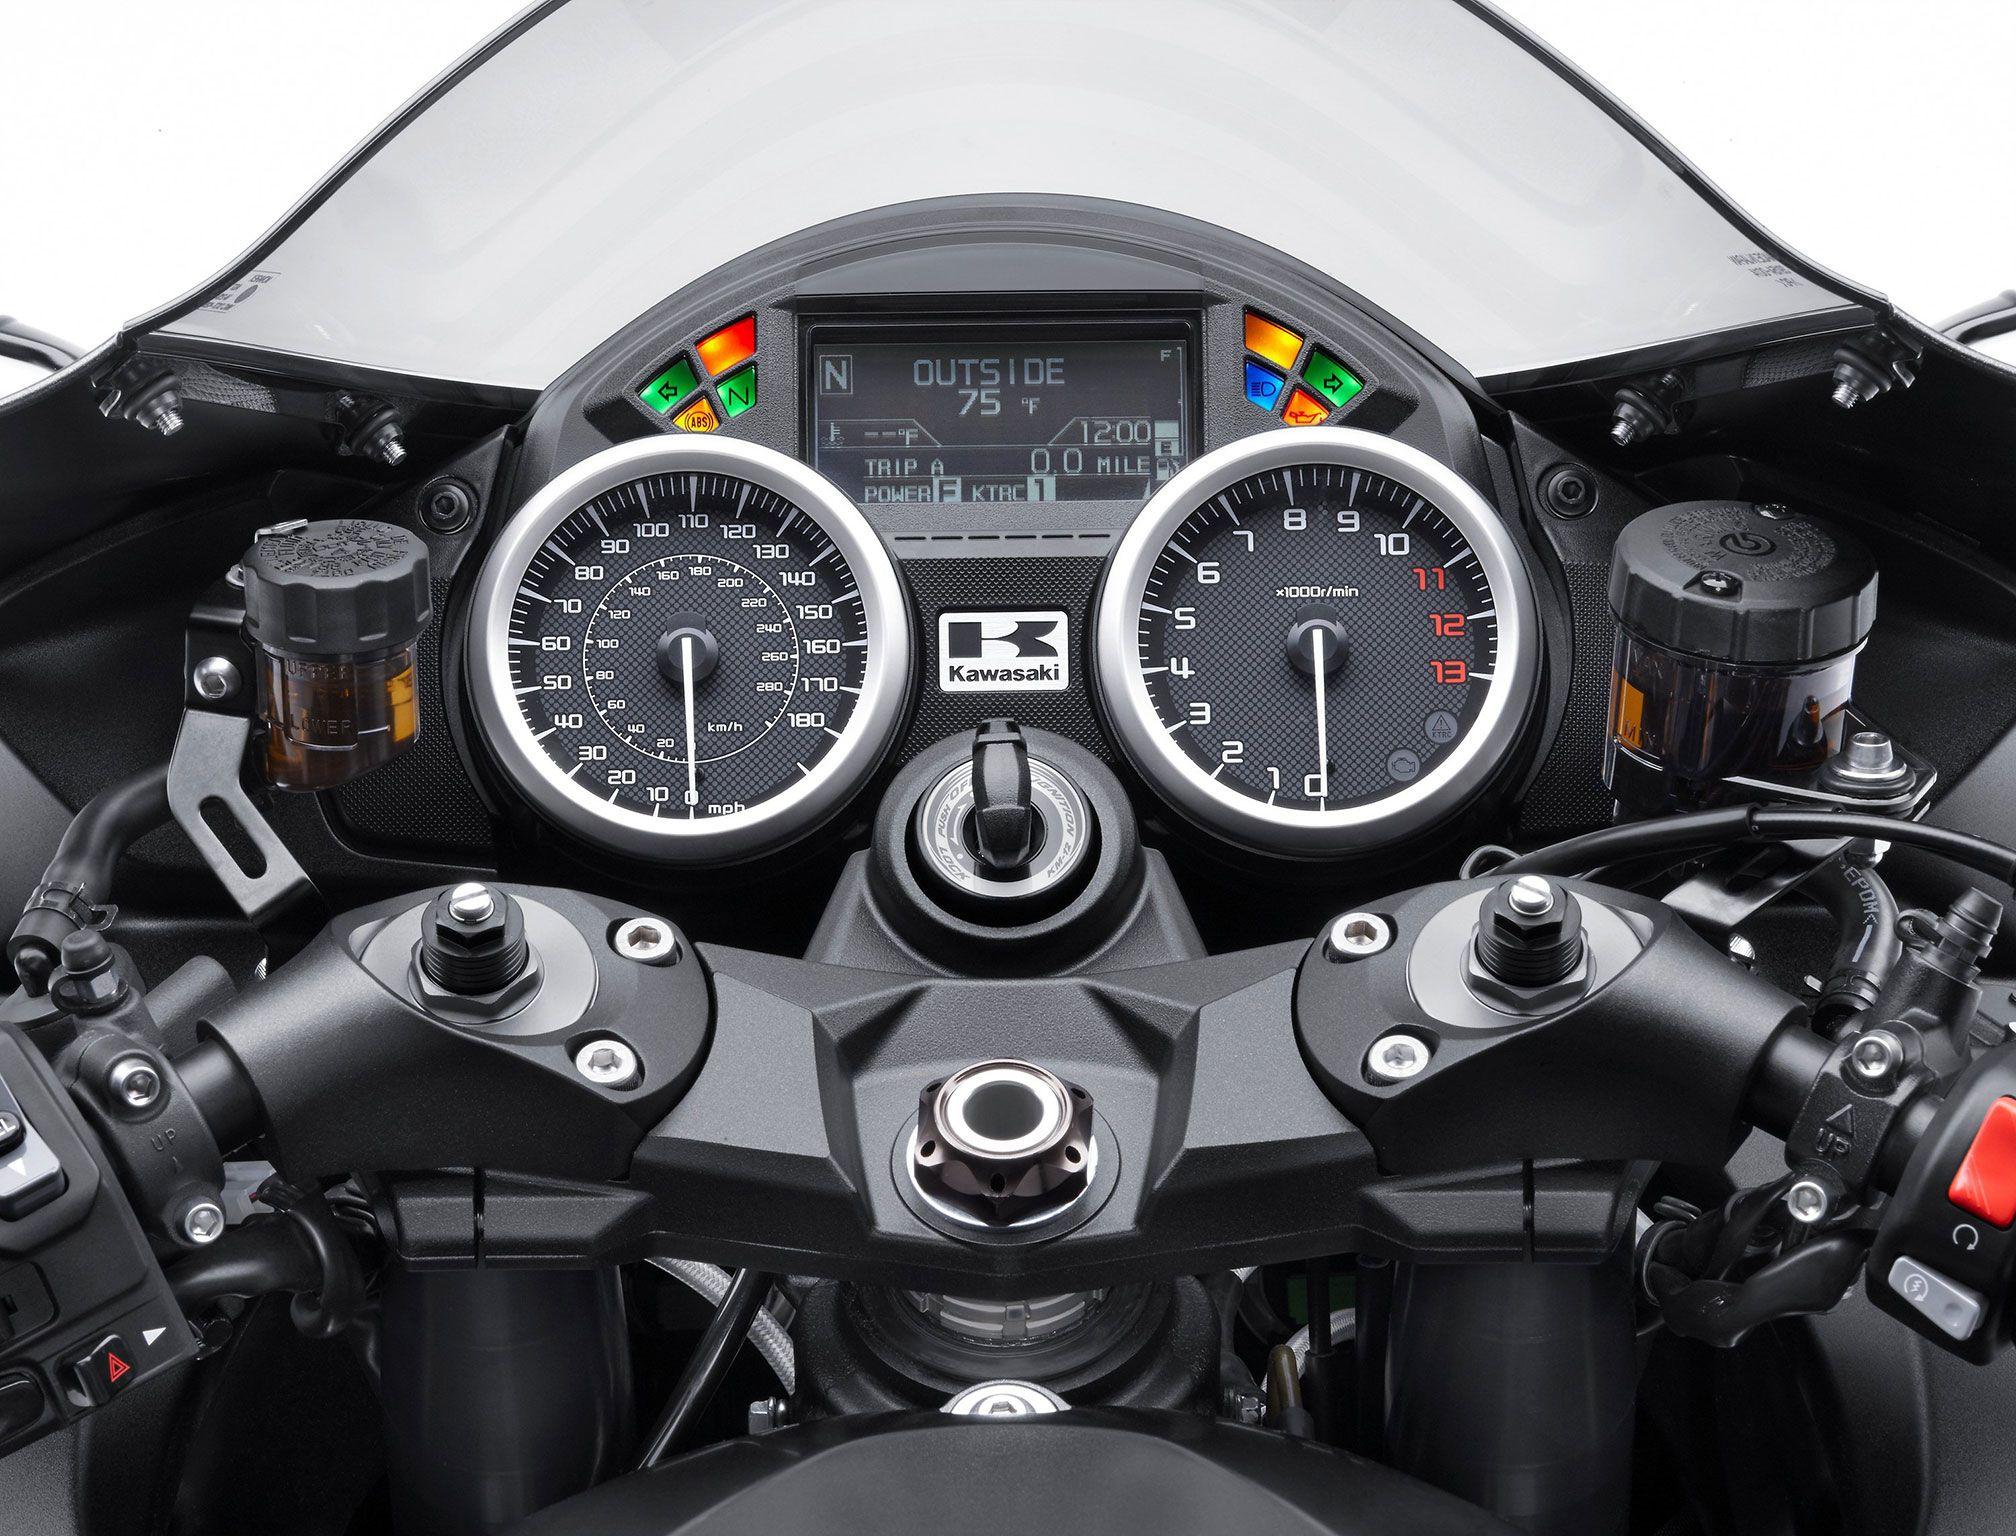 2016 Kawasaki Ninja ZX-14R ABS SE